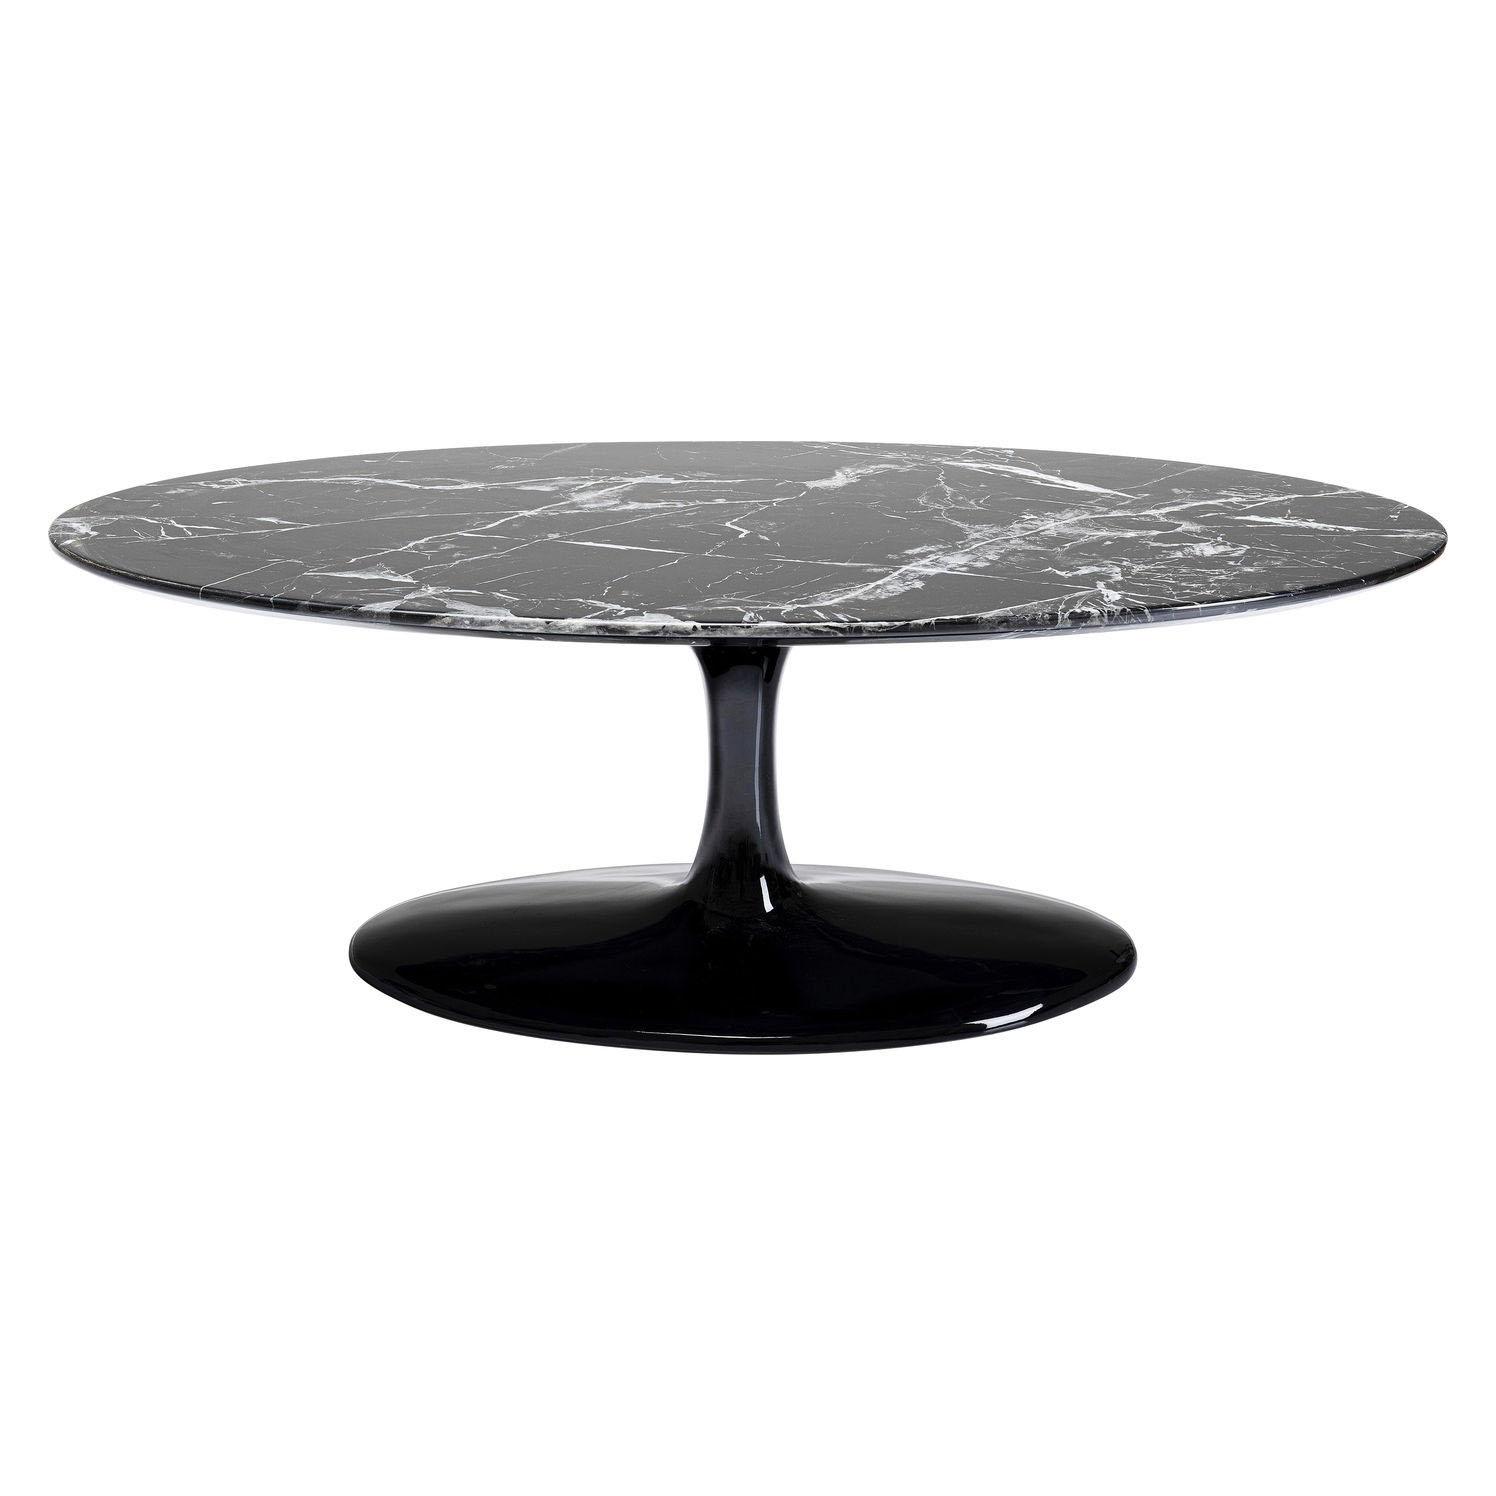 KARE DESIGN Solo Marble Black sofabord - oval granit, fiberglas og polyresin 120x60 cm.